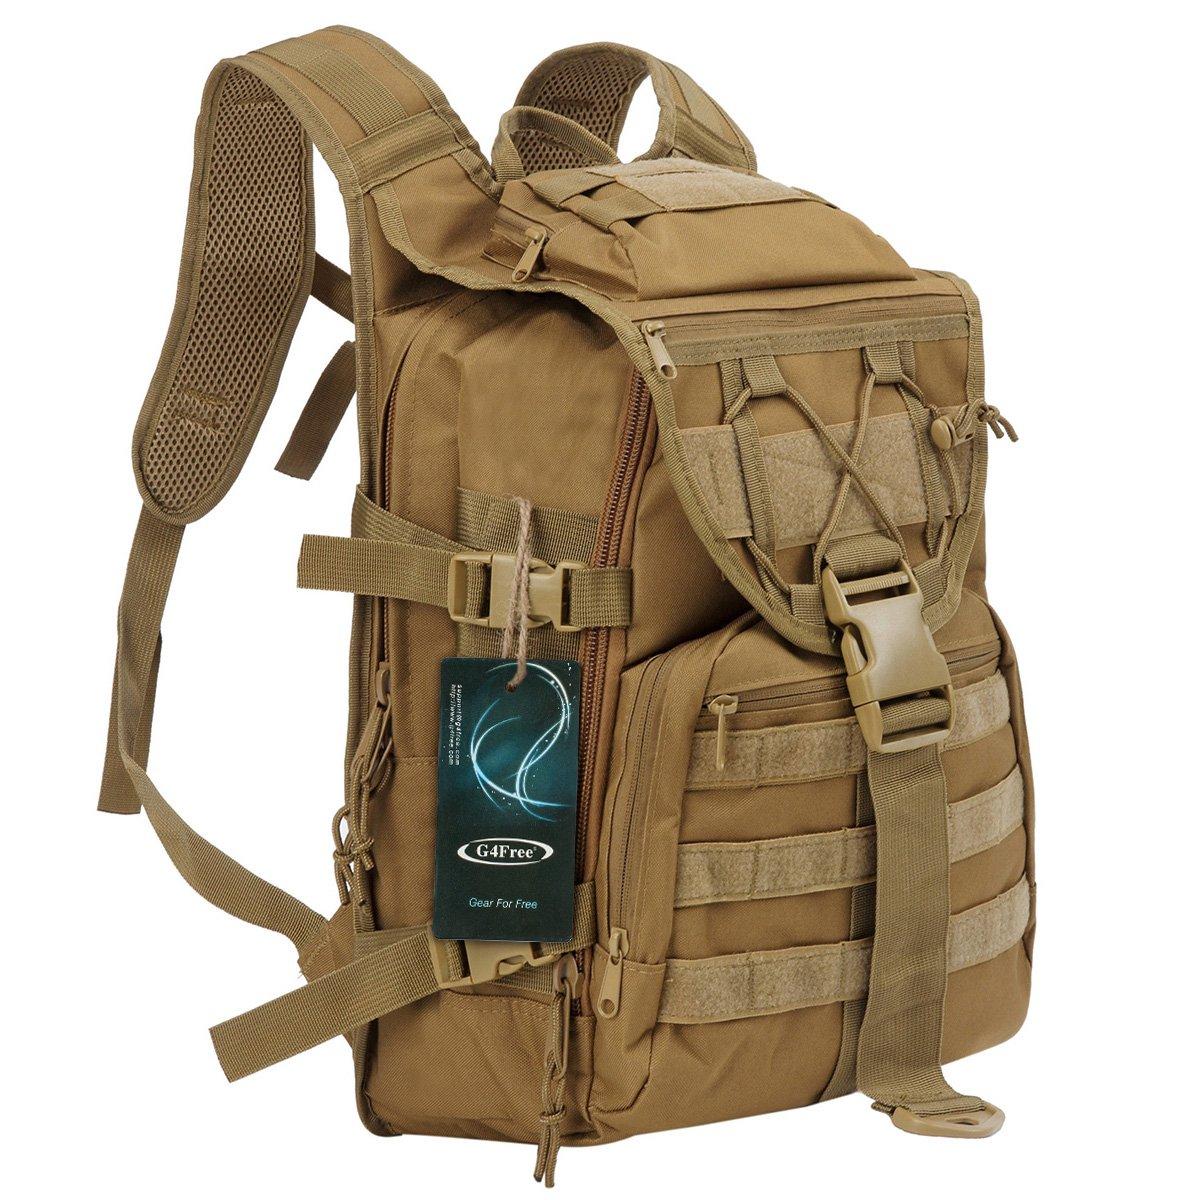 G4Free 20L Tactical Assault Molle extérieure Voyager Camping Randonnée Trekking Sac à dos Sac à dos Sacs